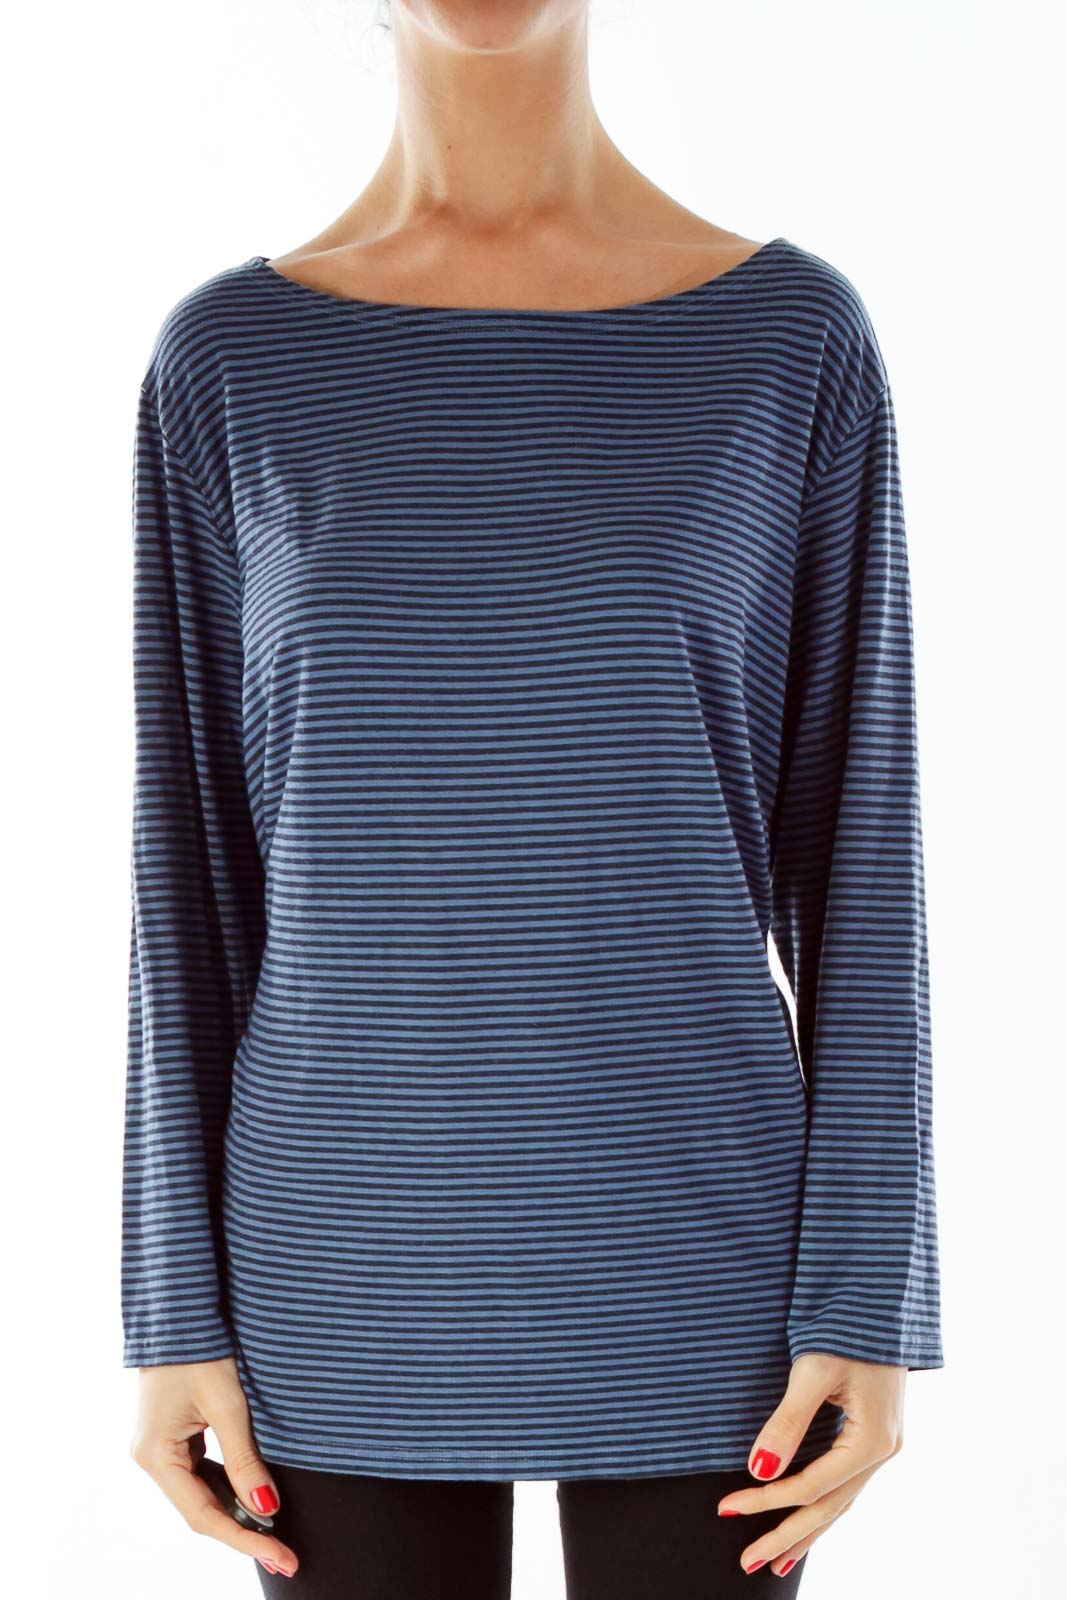 Blue Black Striped Shirt Front